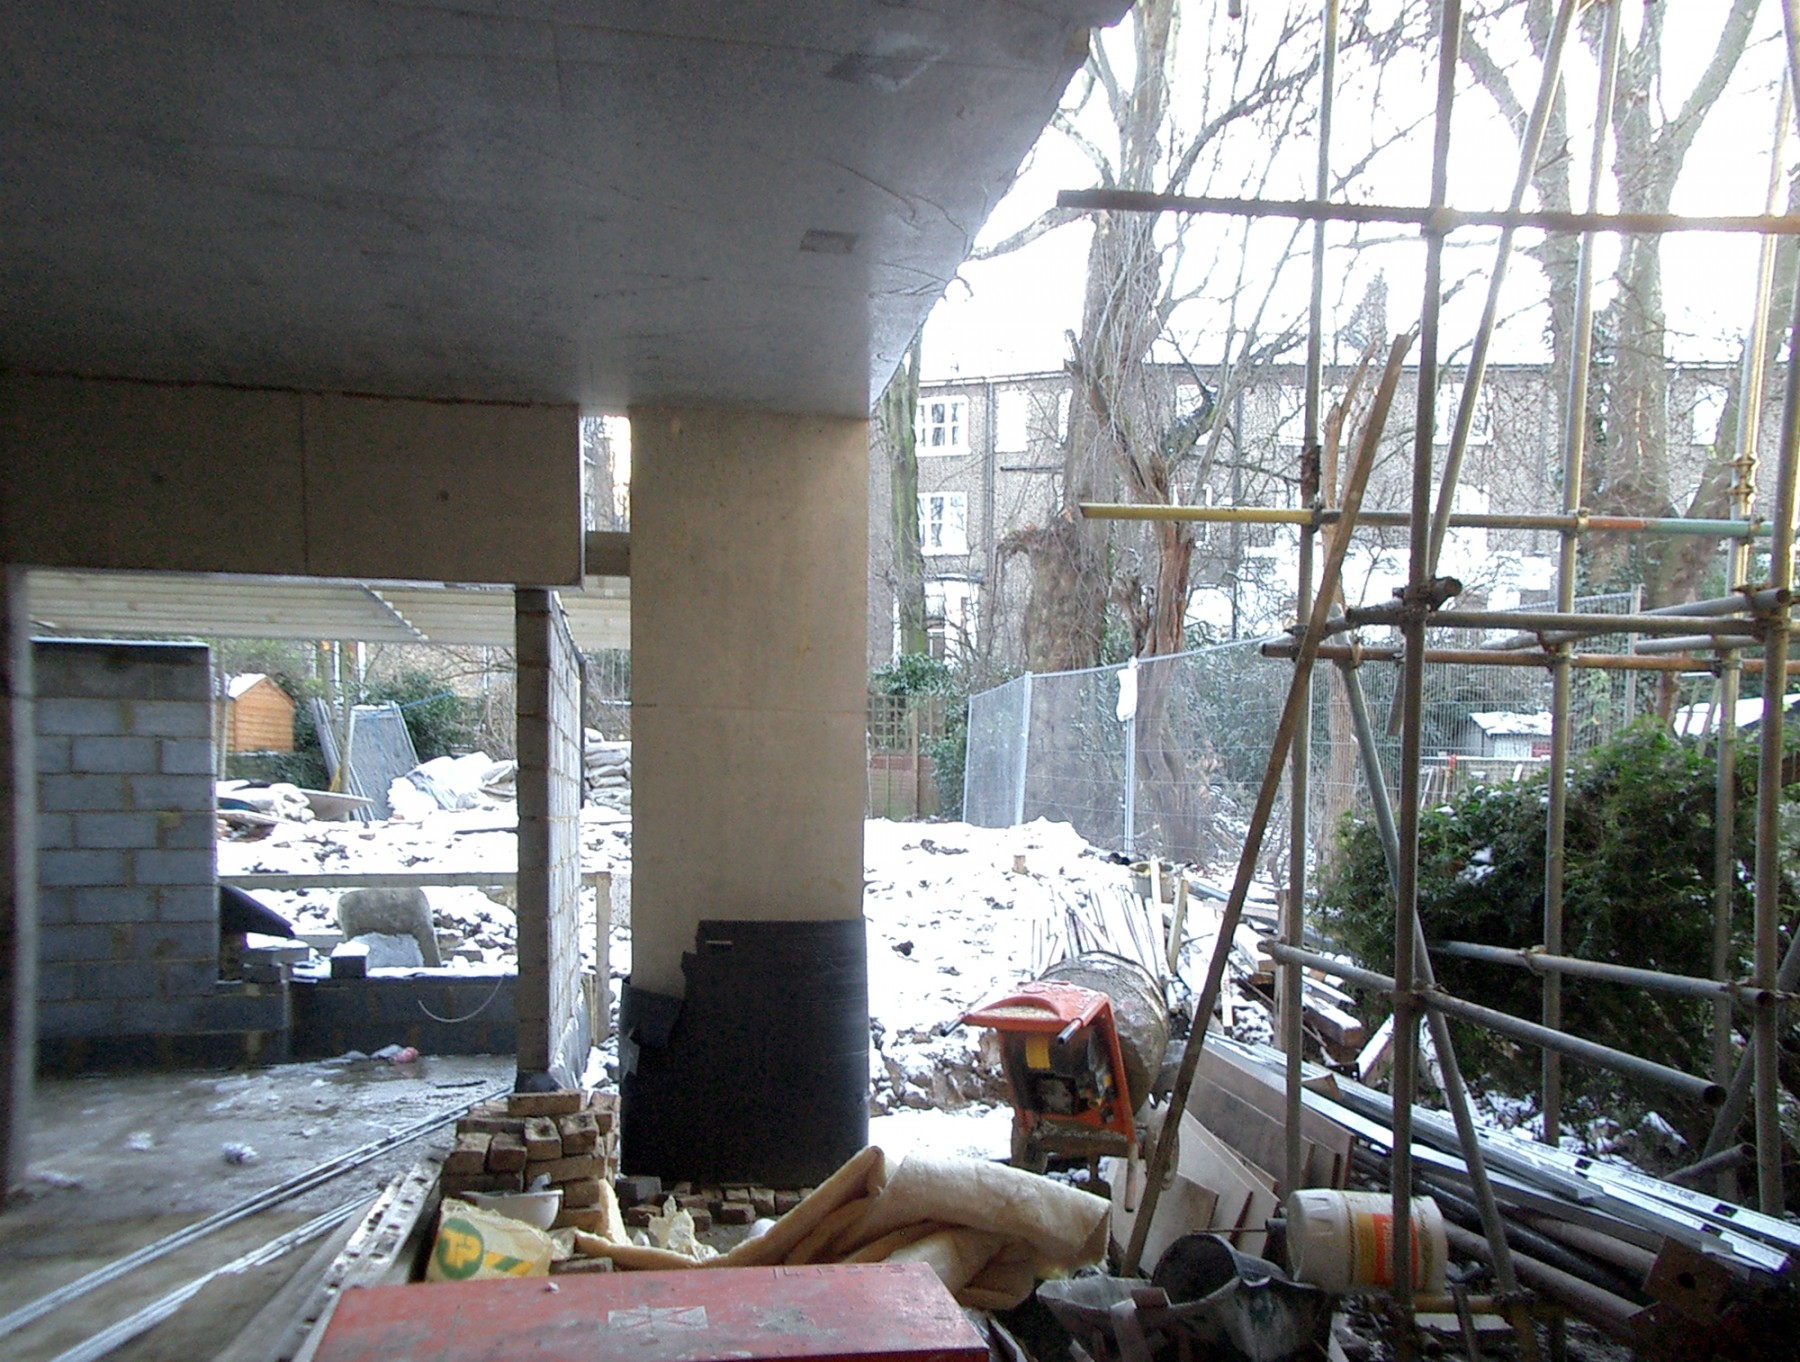 Kander-house-Primrose-hill-London-residential-home-contemporary-interior-Riba-award-victorian-Jamie-Fobert-Architects-construction-site-2